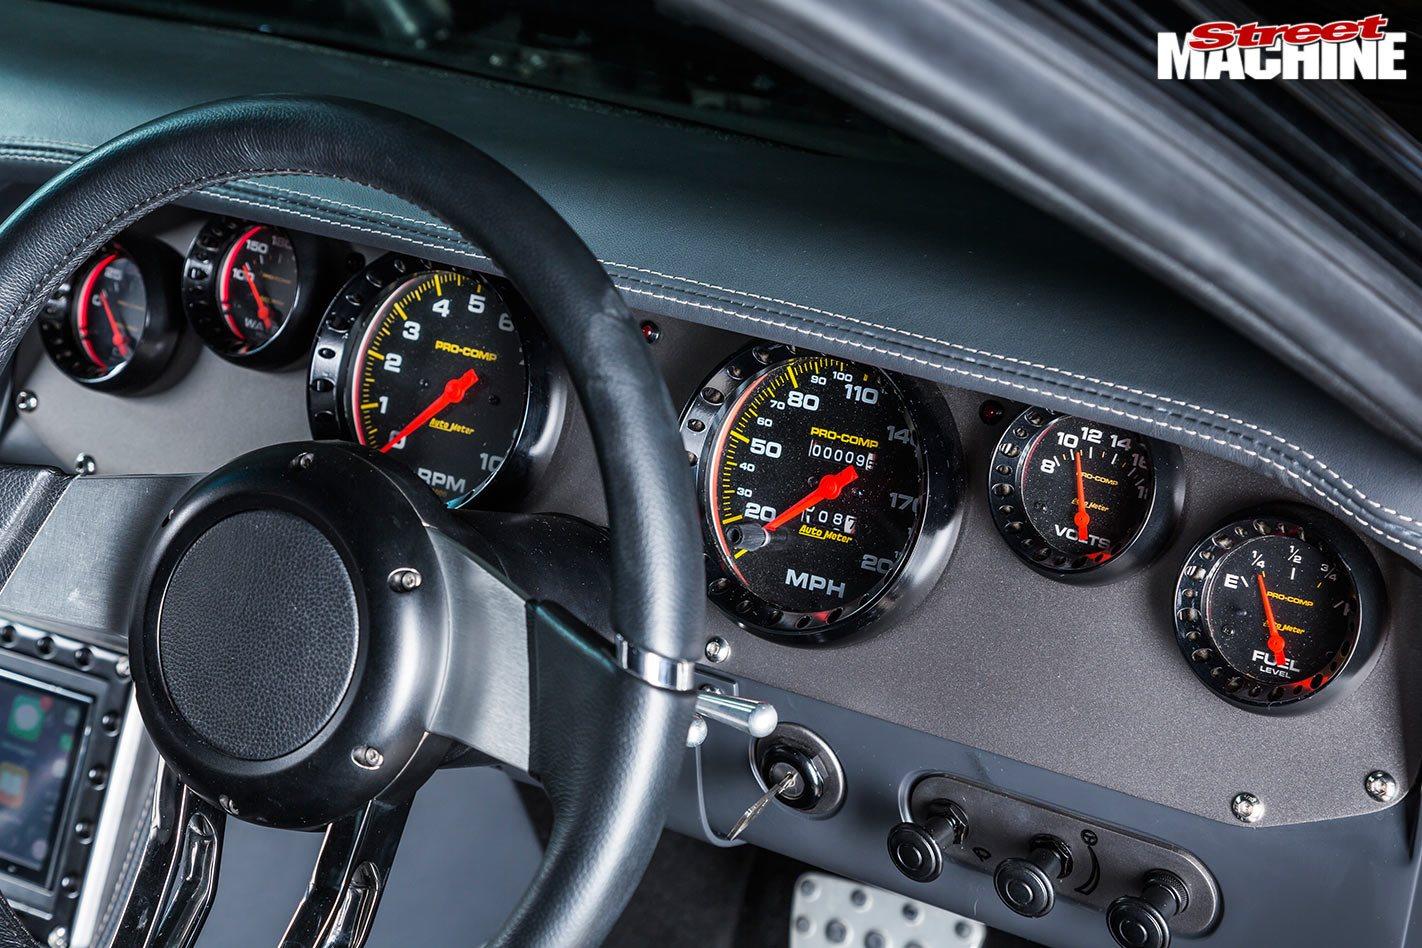 Plymouth Barracuda gauges